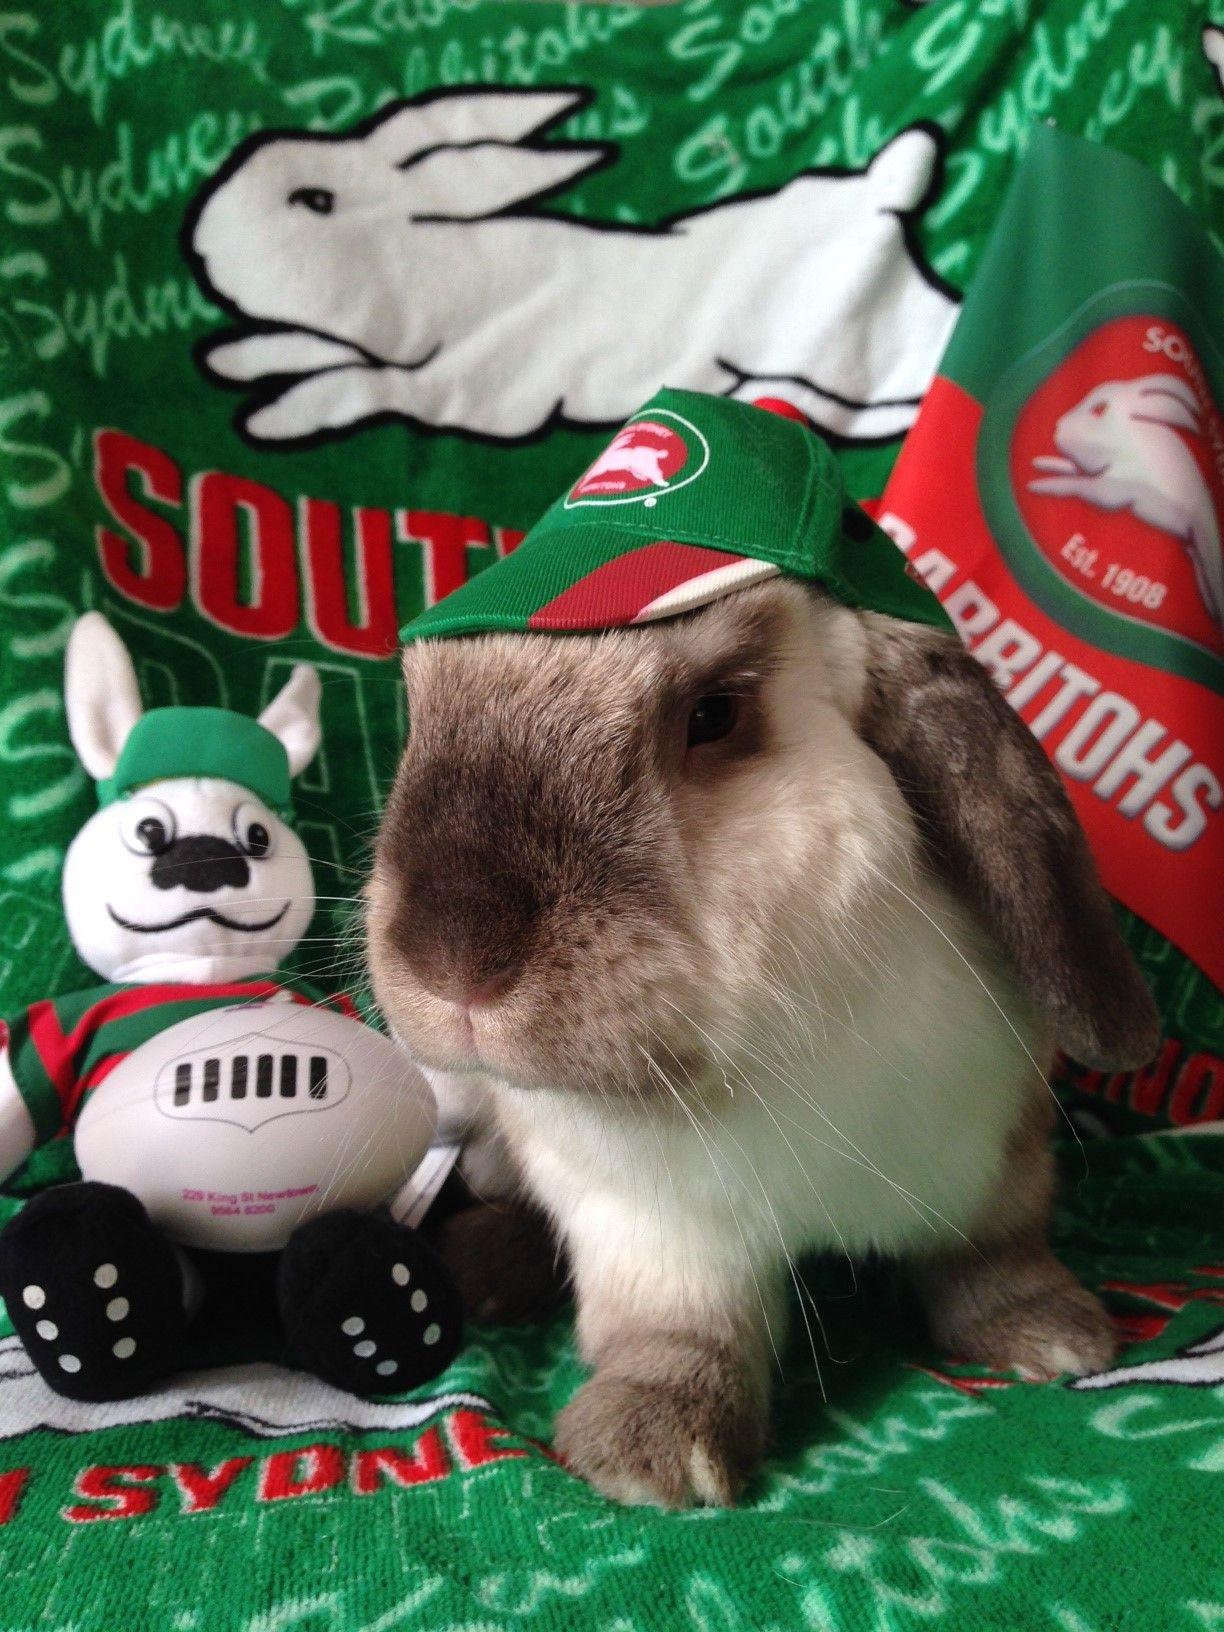 It S The Bunday Super Bowl Down Undah Rabbits In Australia Australian Rugby League Cute